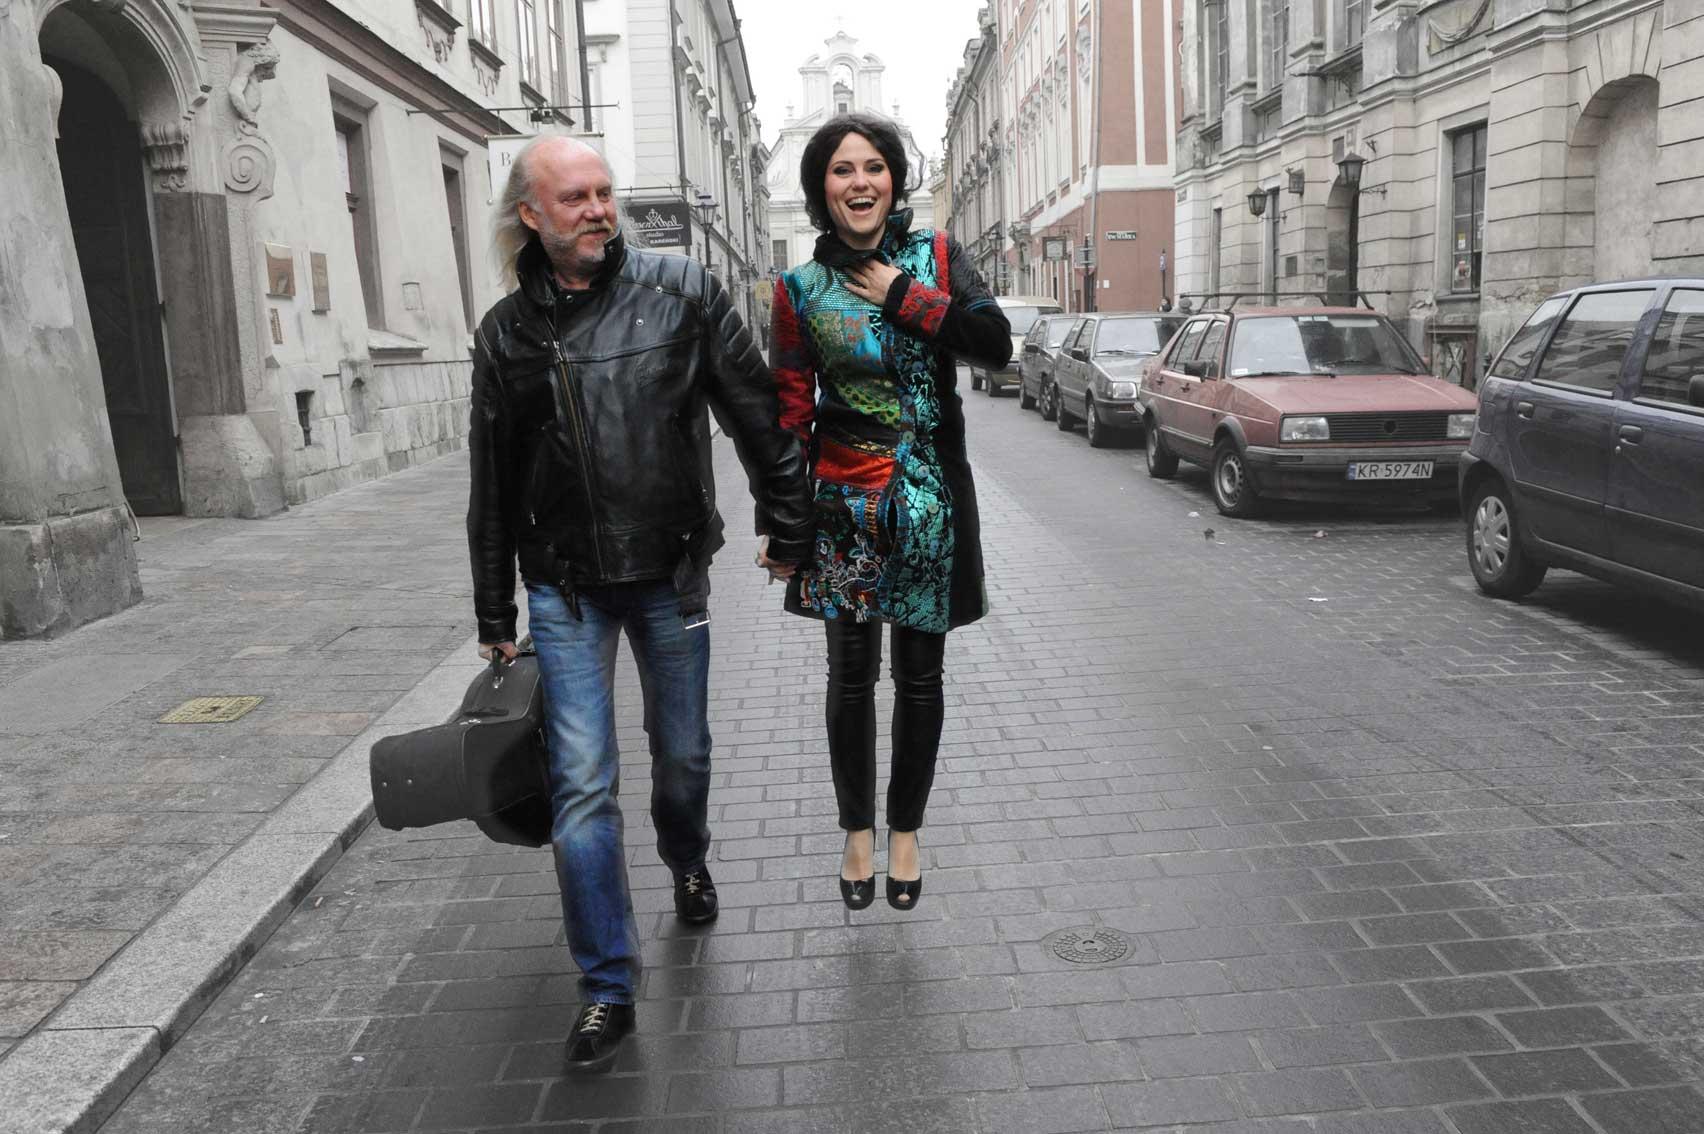 fot. Tomasz Sikora